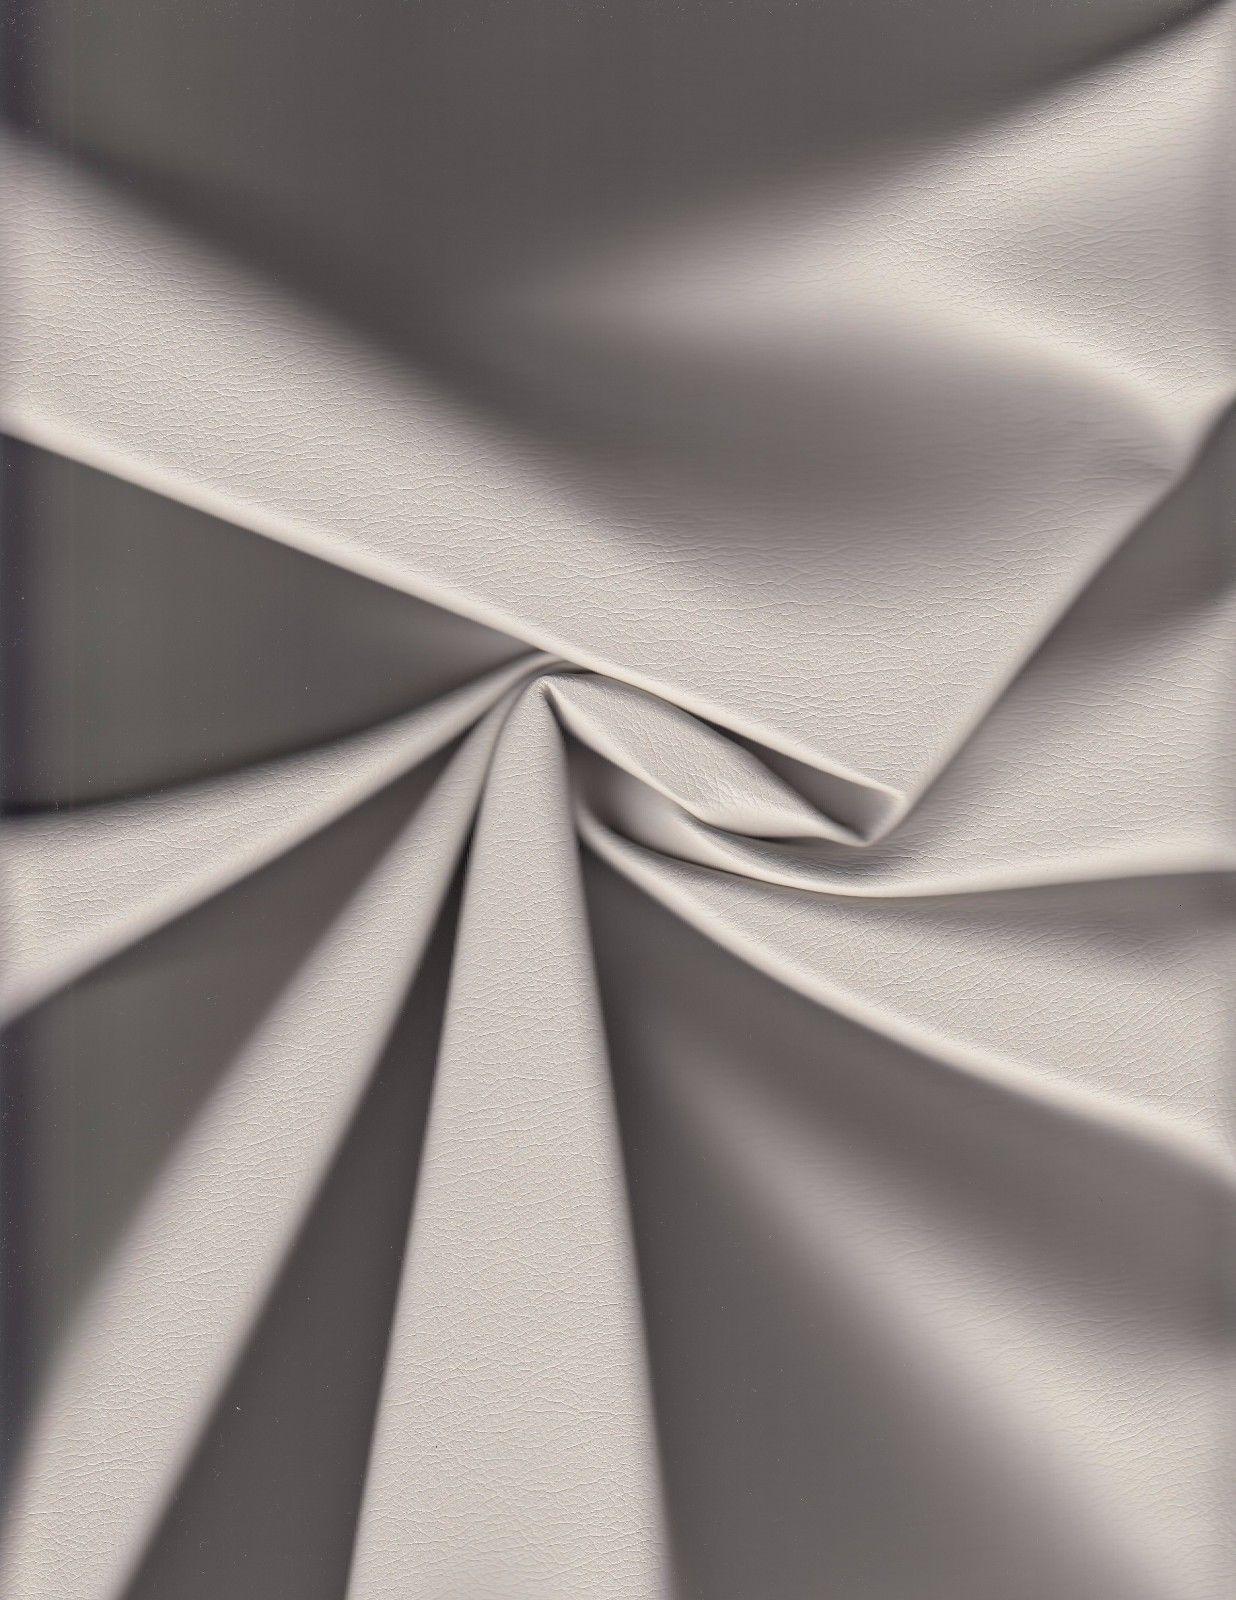 Ultrafabrics Tela para Tapizar Piel Sintética Ultraleather Ártico 3.7m PL1